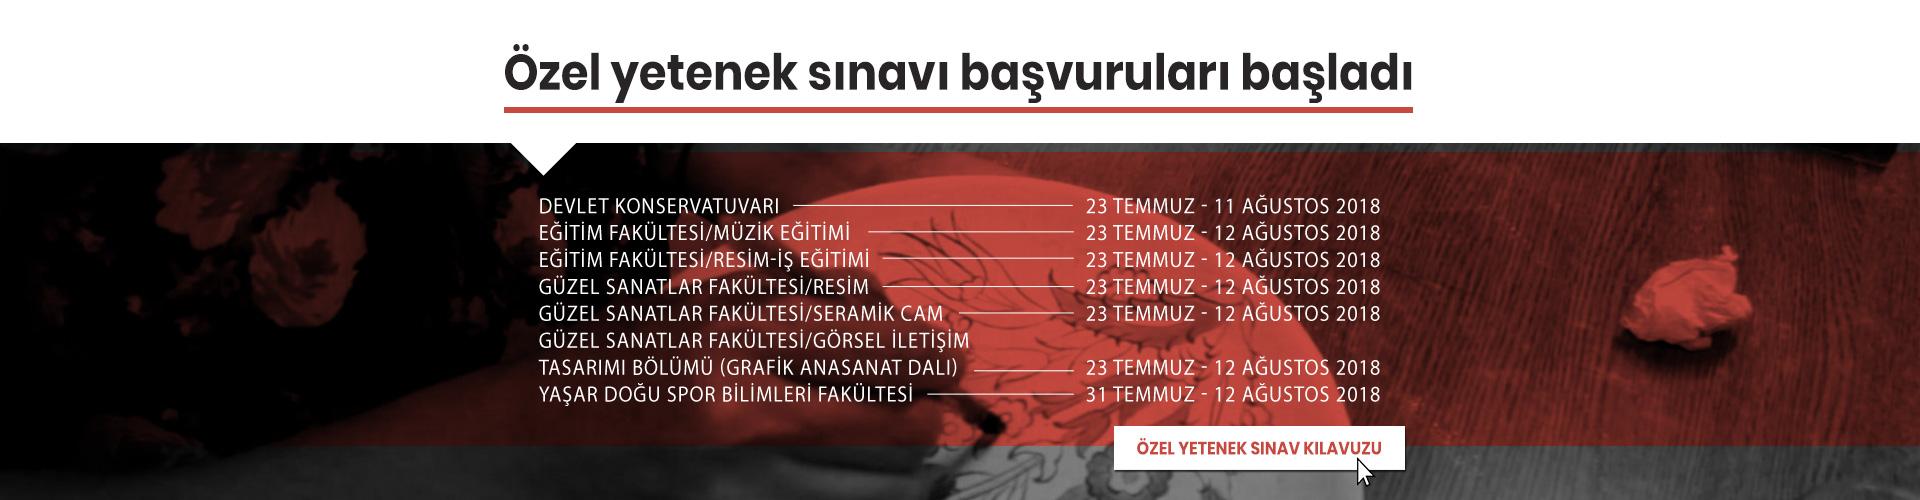 http://www.omu.edu.tr/sites/default/files/files/omu_ozel_yetenek_sinavlari_basvurulari_basladi/omu_ozelyetenek-slider2018.jpg